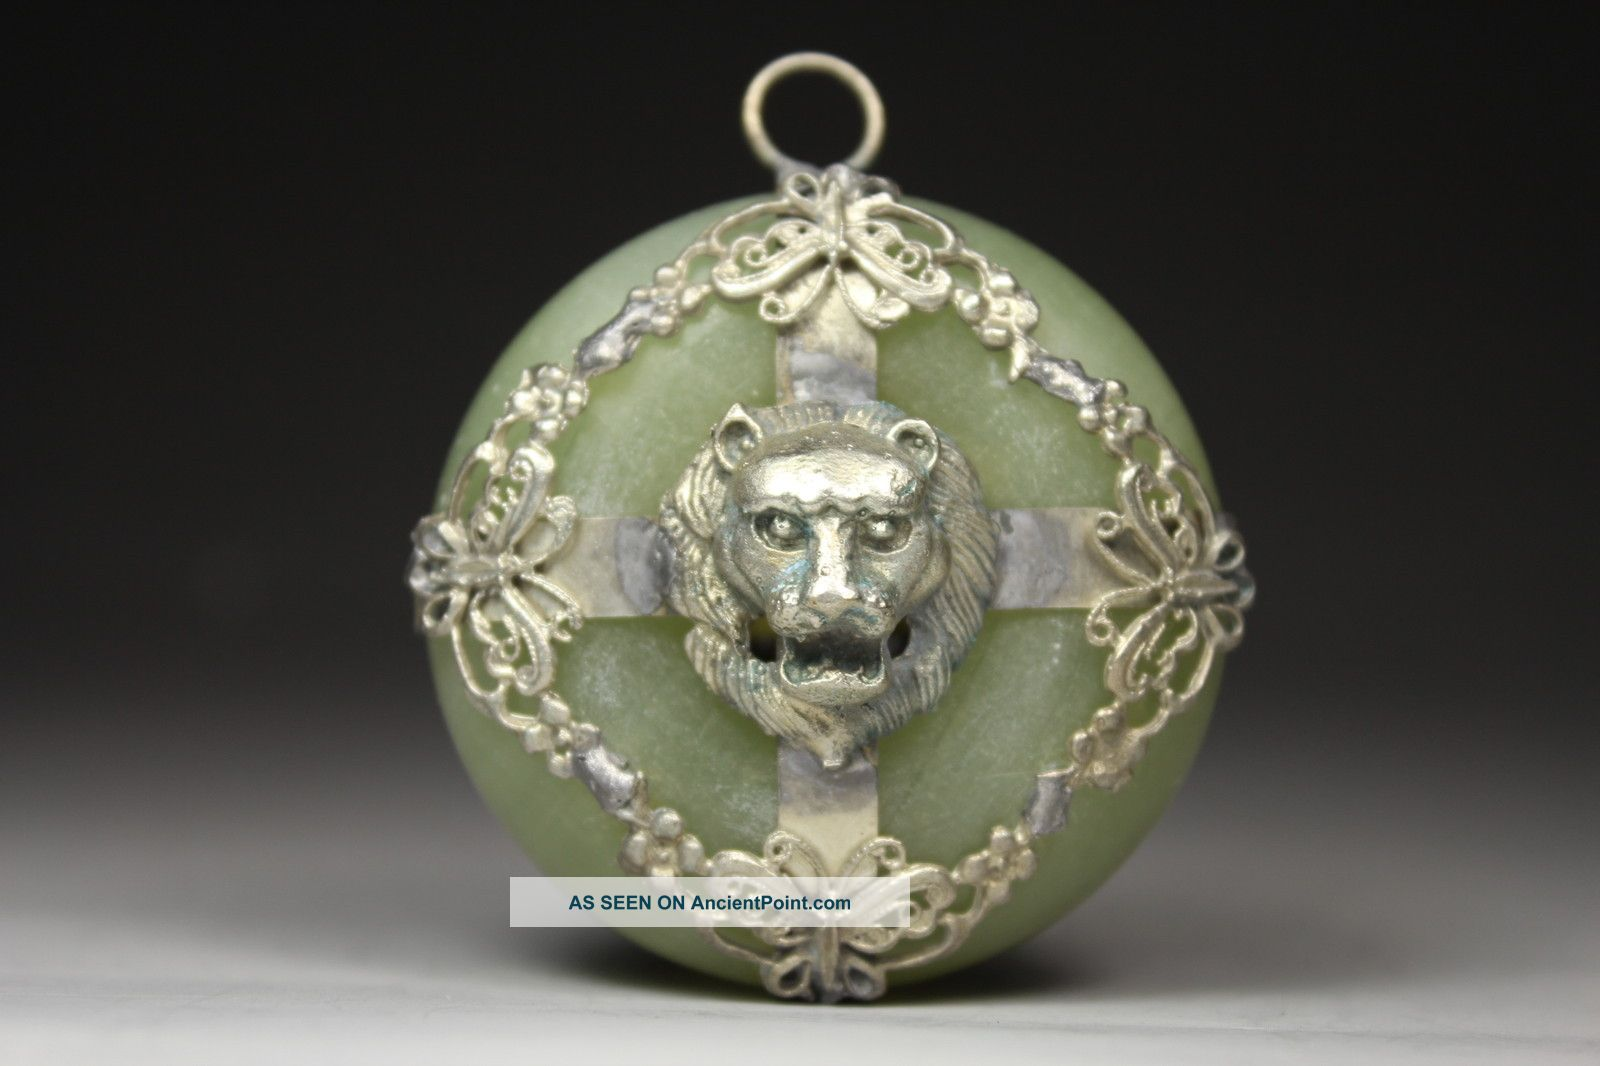 Chinese Handwork Lion Old Jade Pendant Uncategorized photo